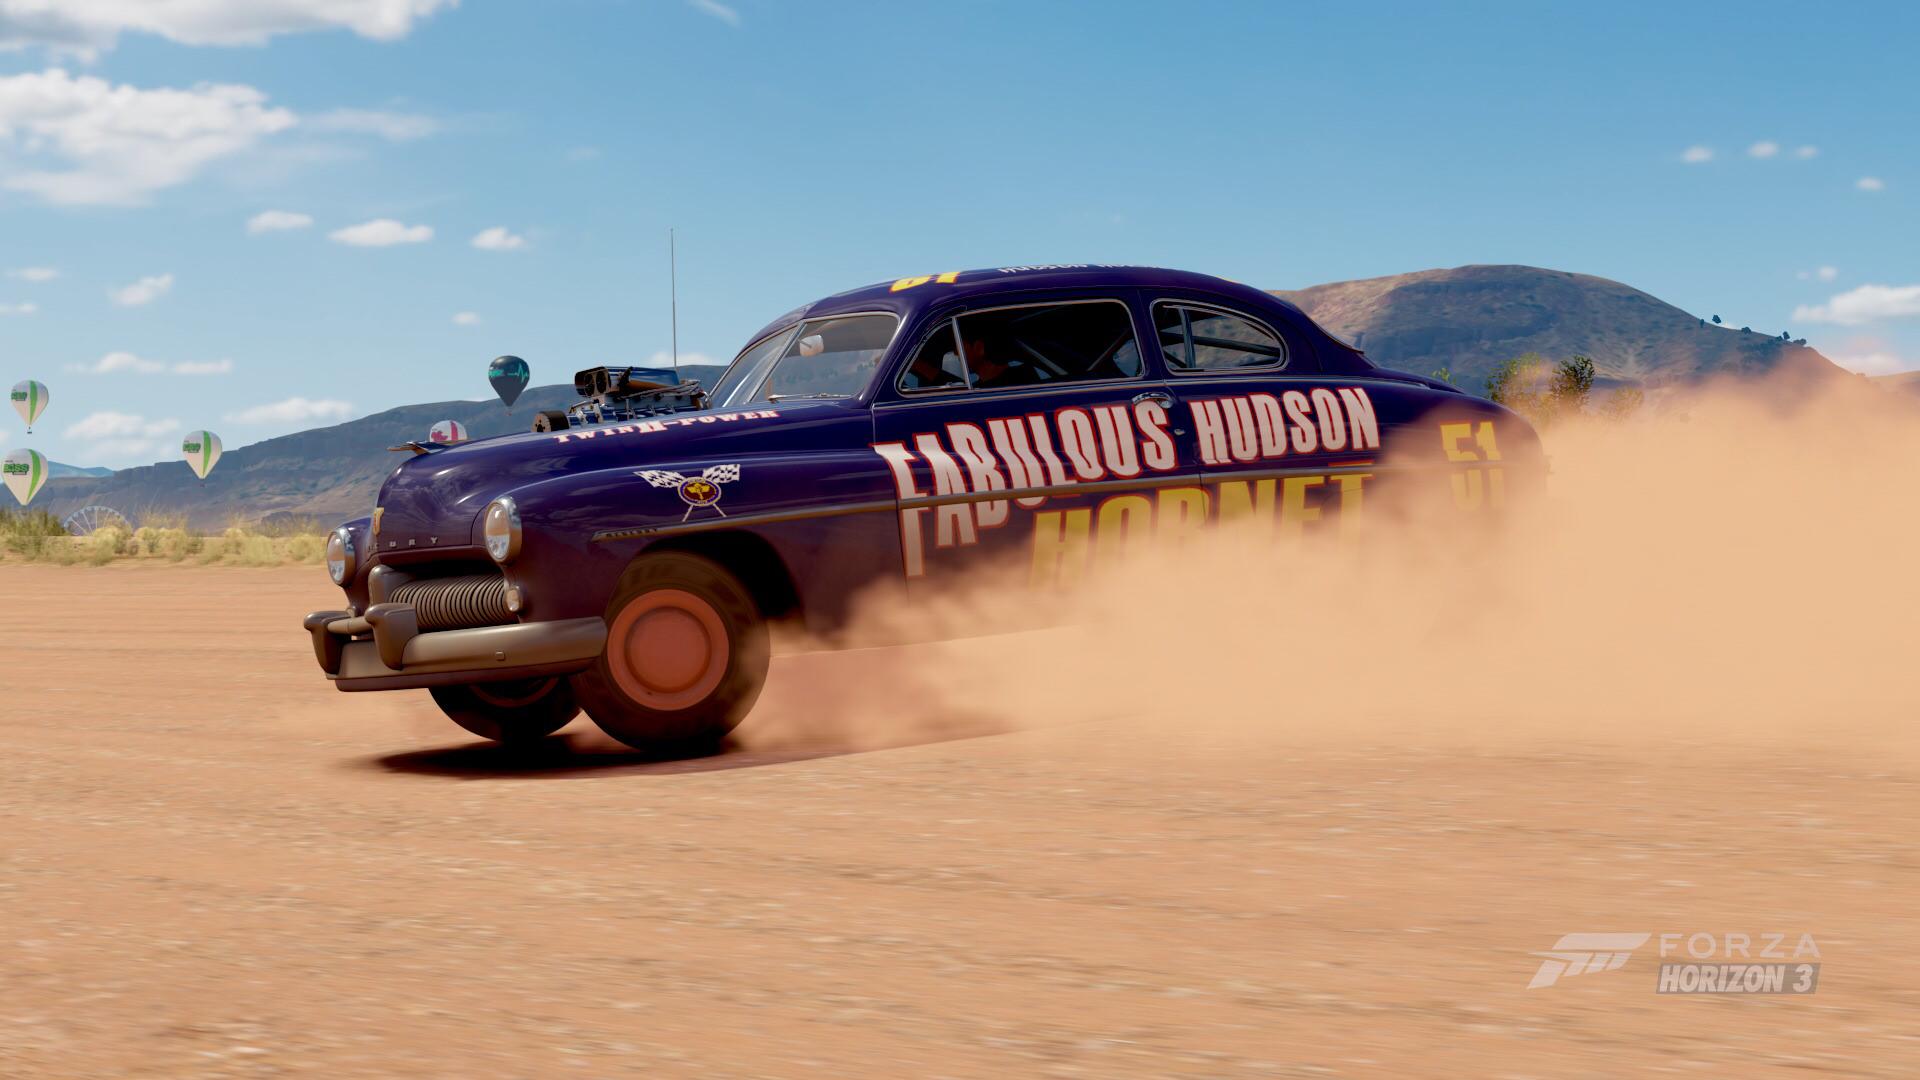 The fabulous Hudson hornet forza 1920x1080